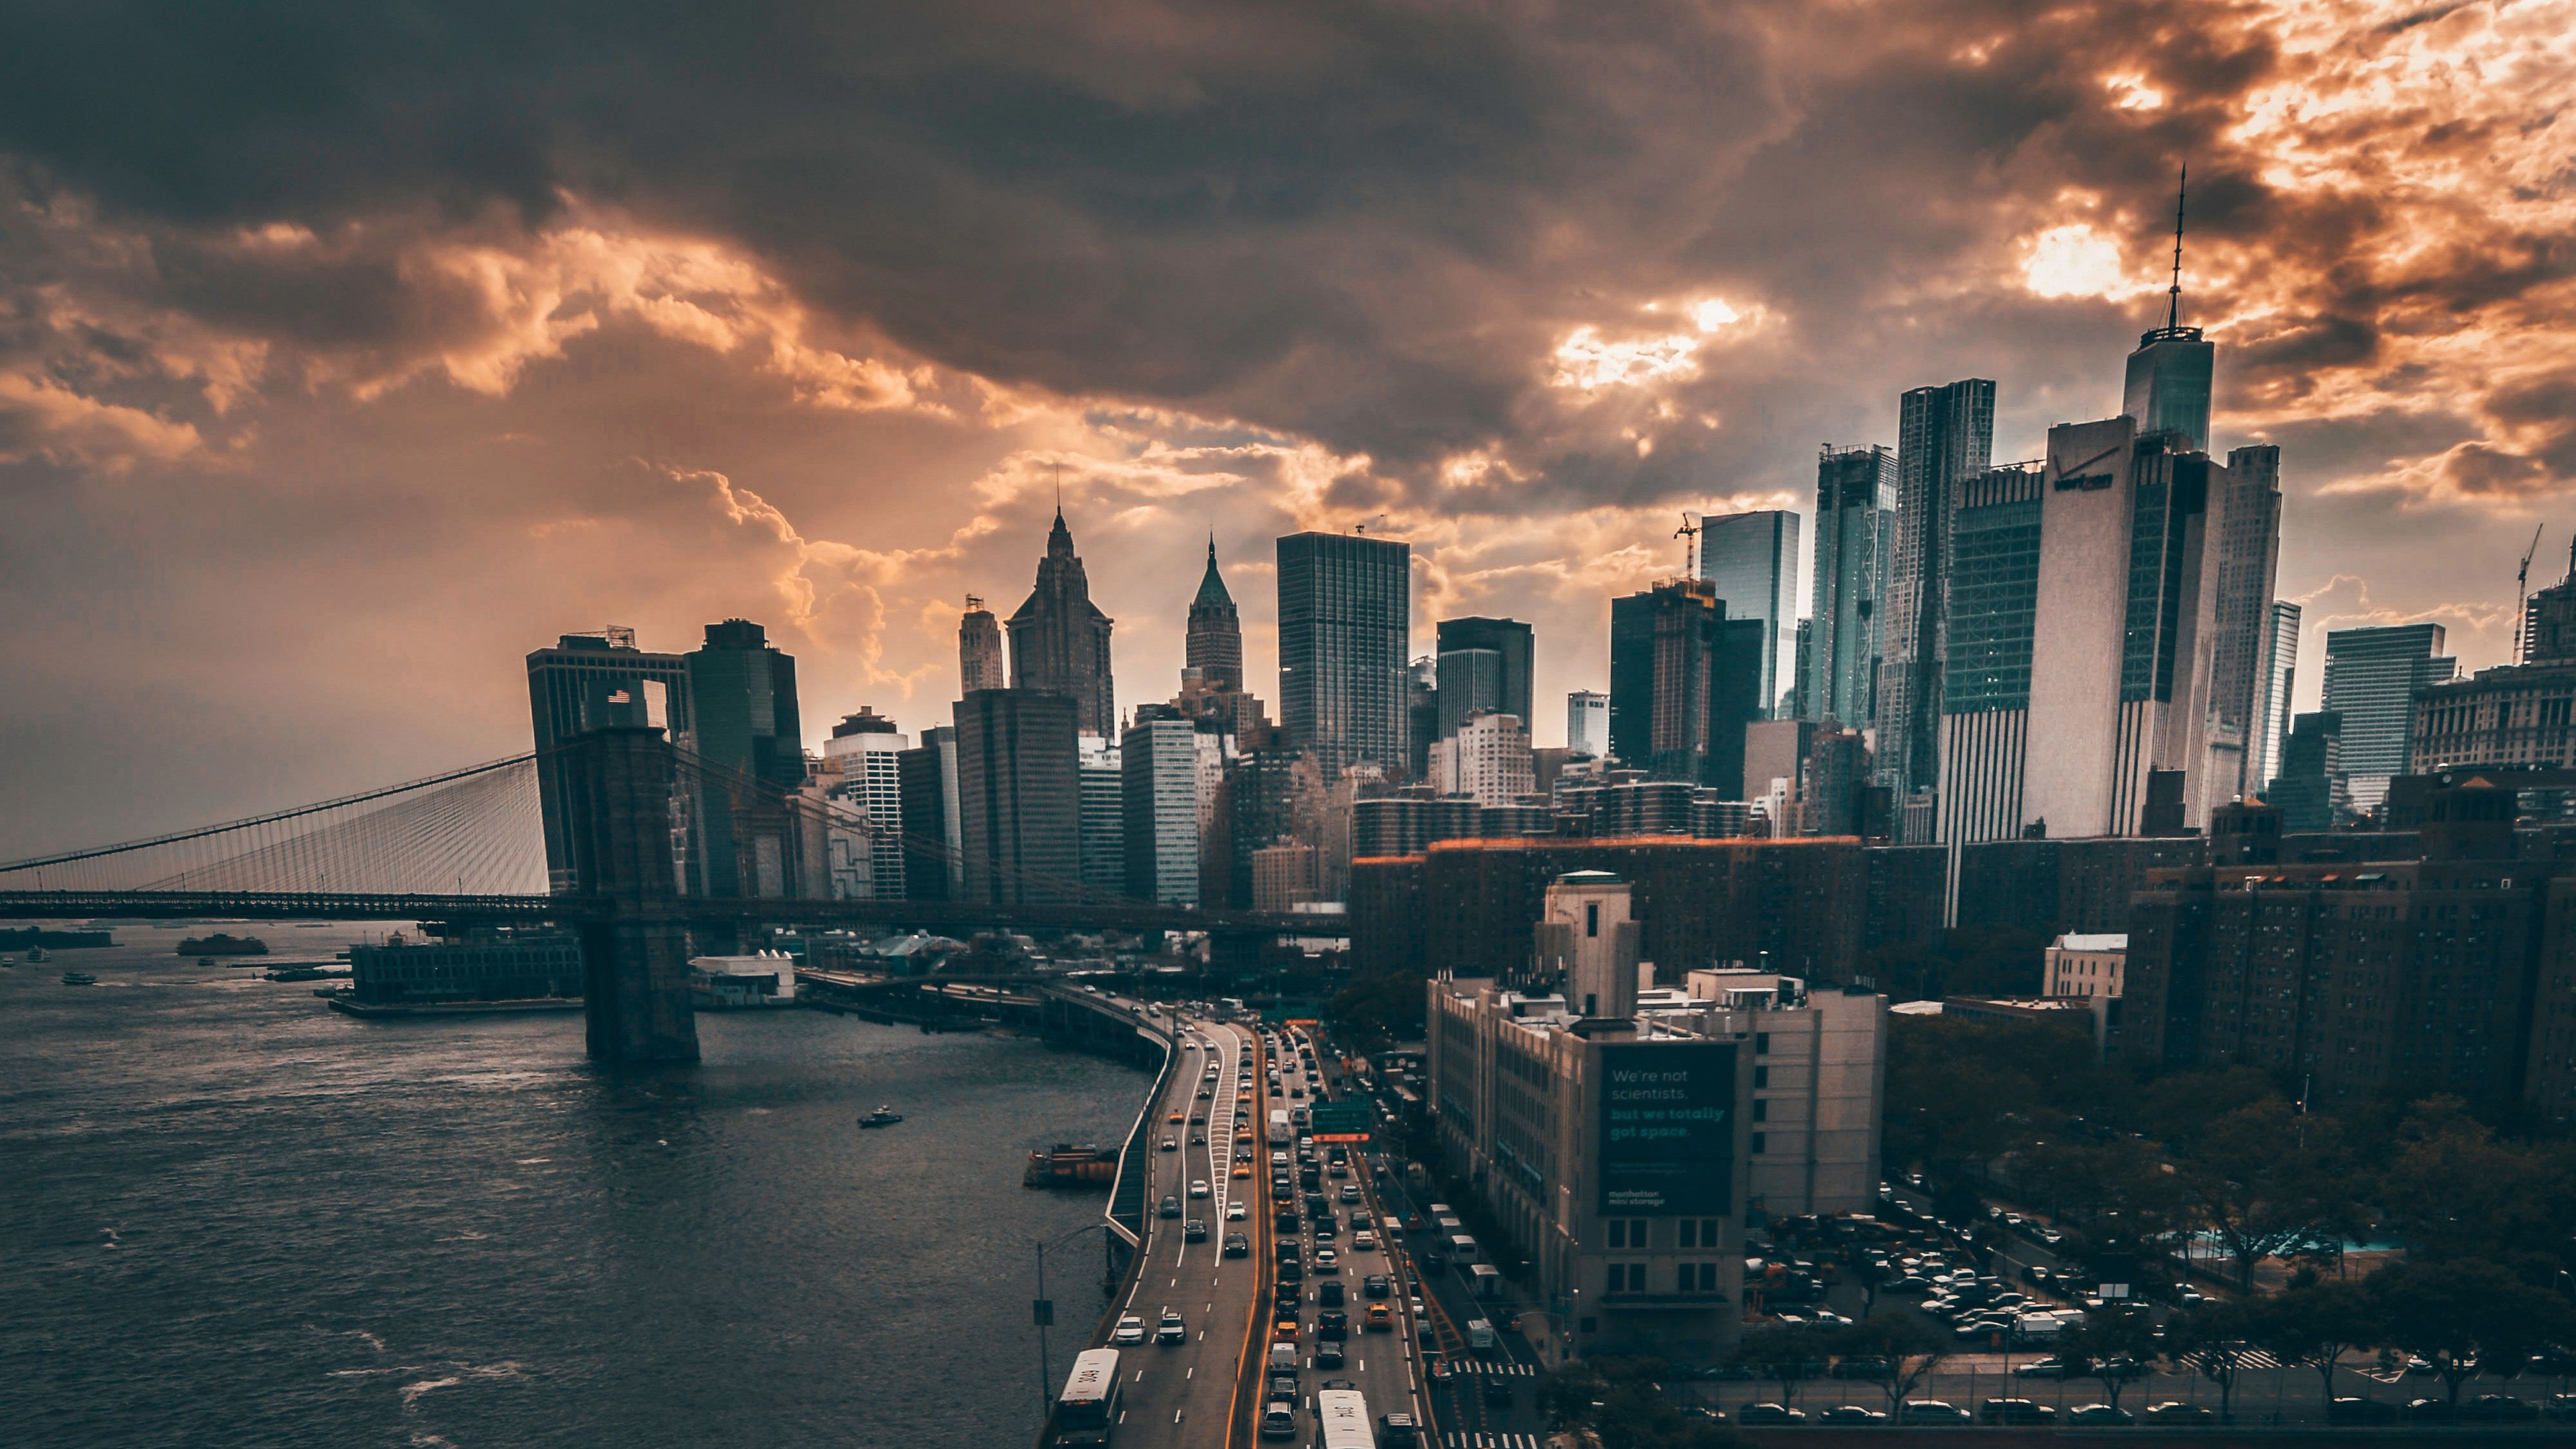 manhattan new york city 4k 1538072025 - Manhattan New York City 4k - world wallpapers, new york wallpapers, manhattan wallpapers, hd-wallpapers, city wallpapers, 4k-wallpapers